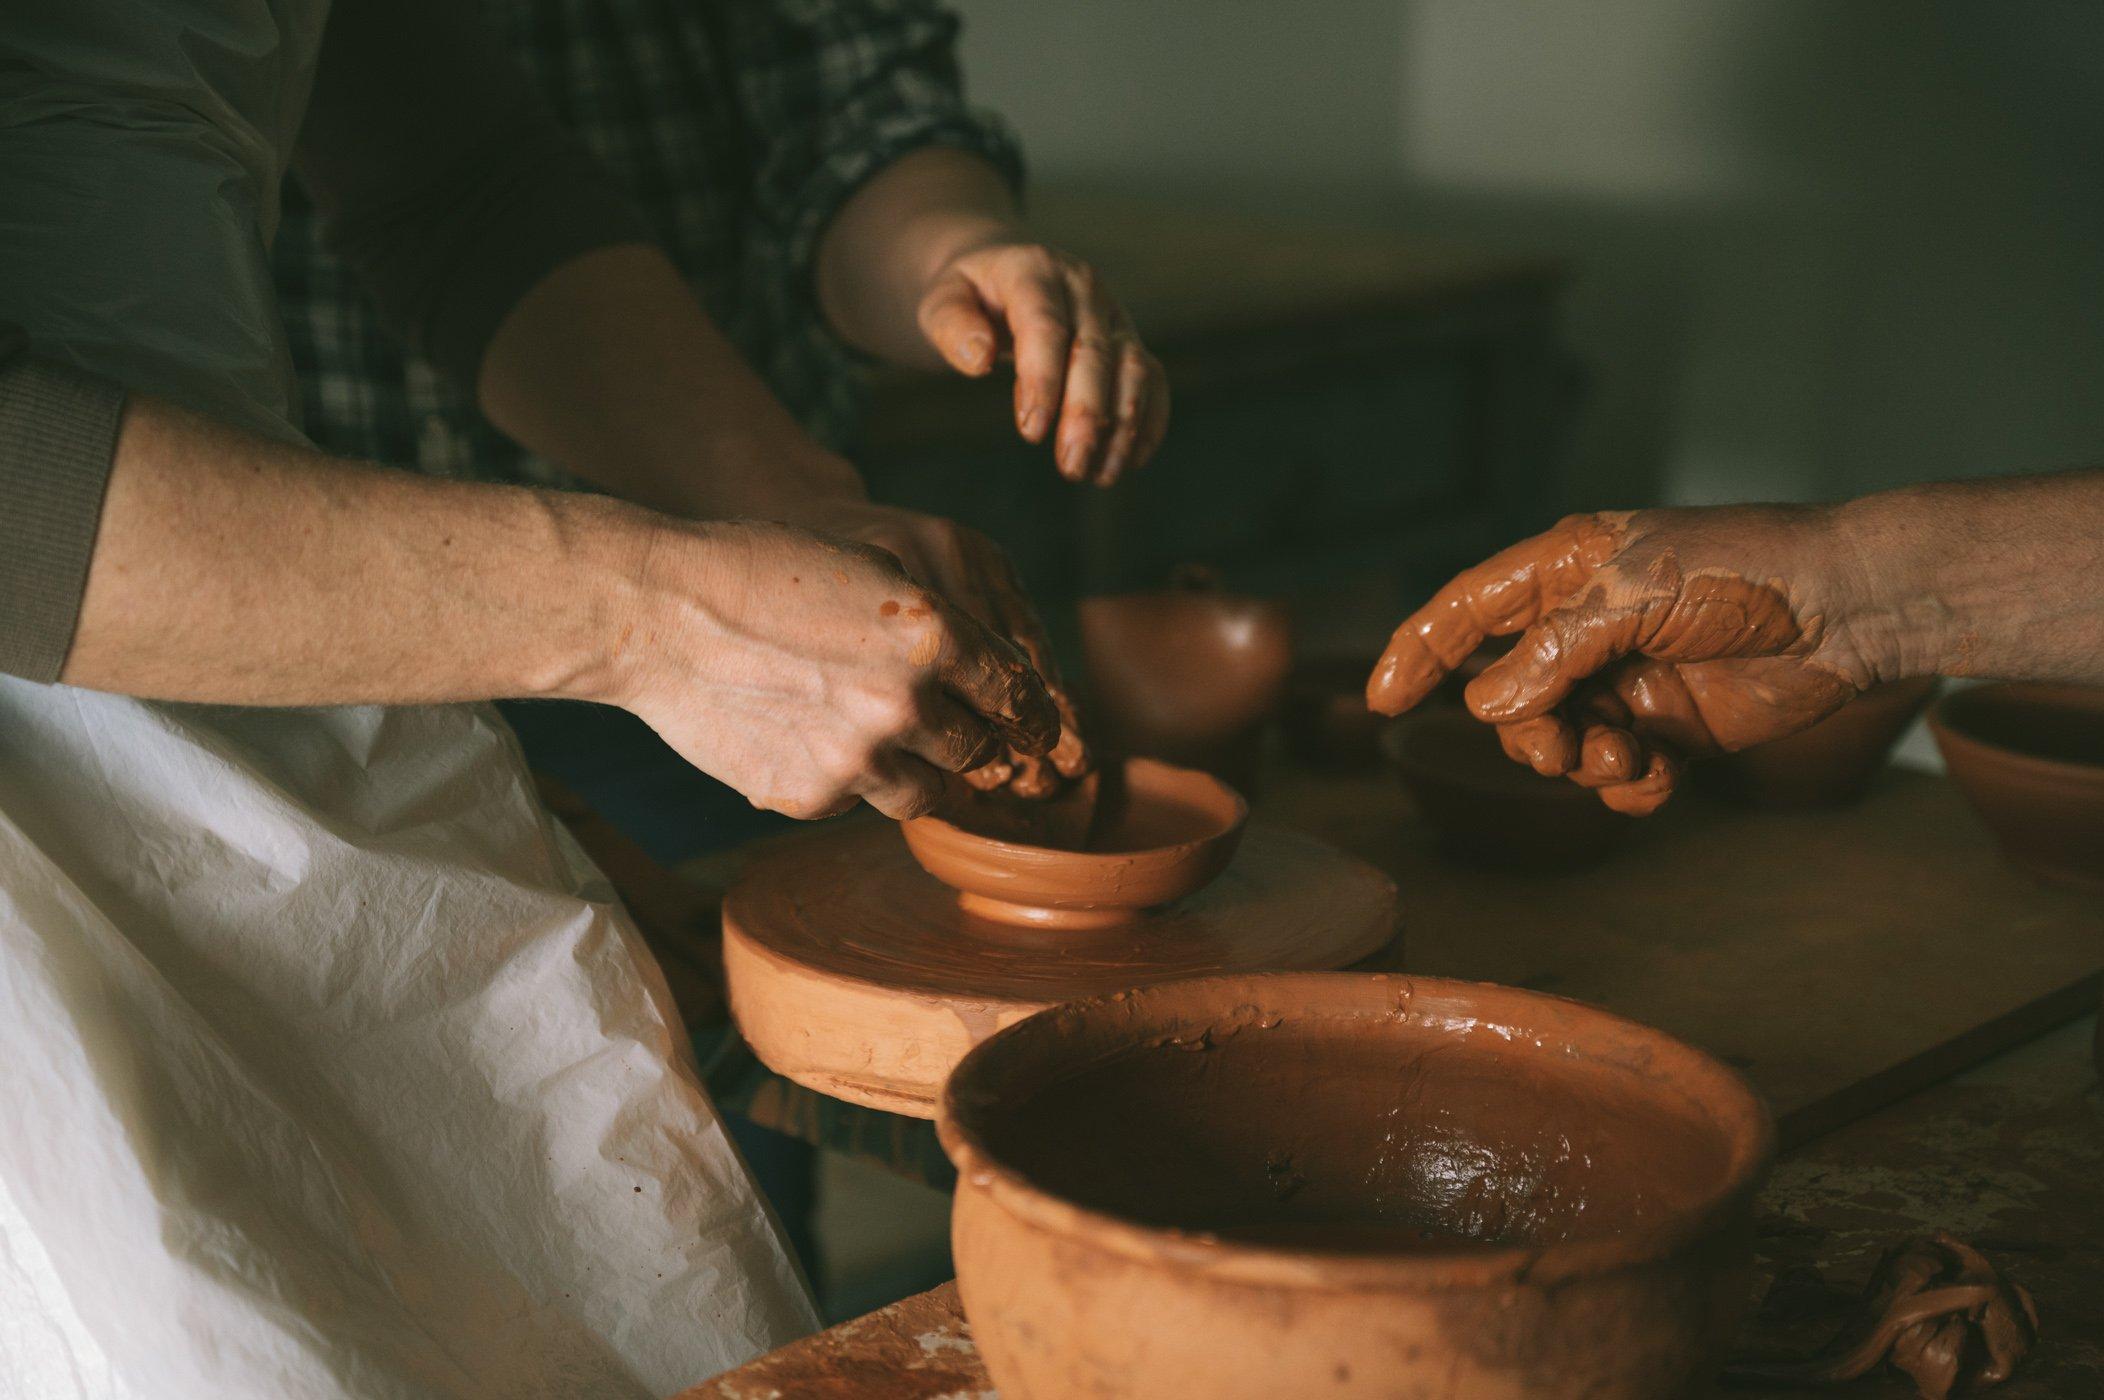 Pottery workshop at São Lourenço do Barrocal farmstay retreat in the Alentejo region of Portugal